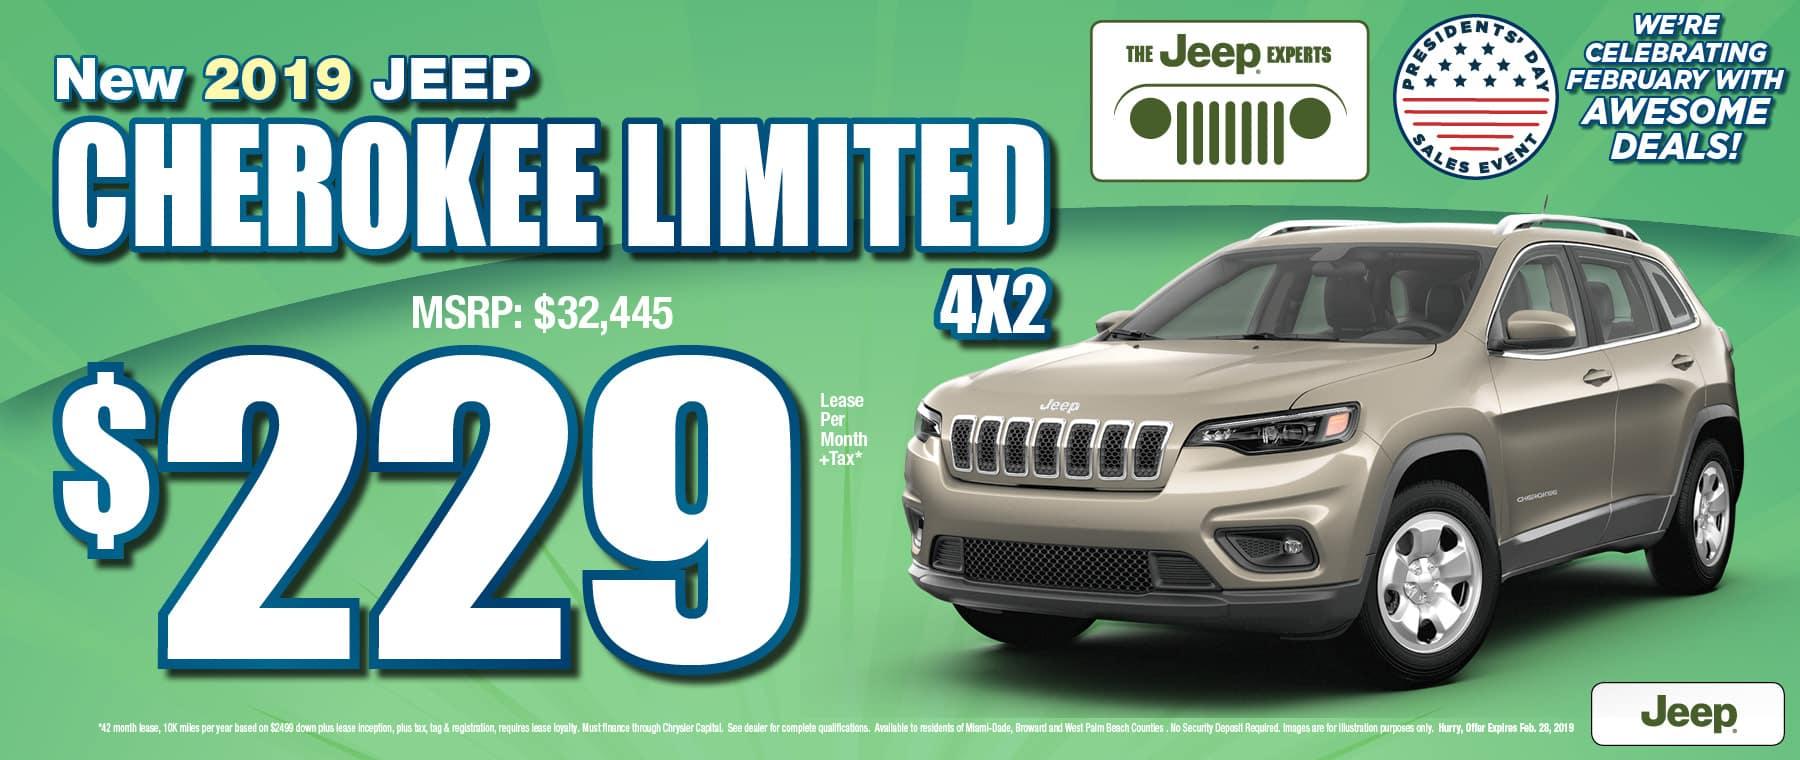 Cherokee $229 Lease